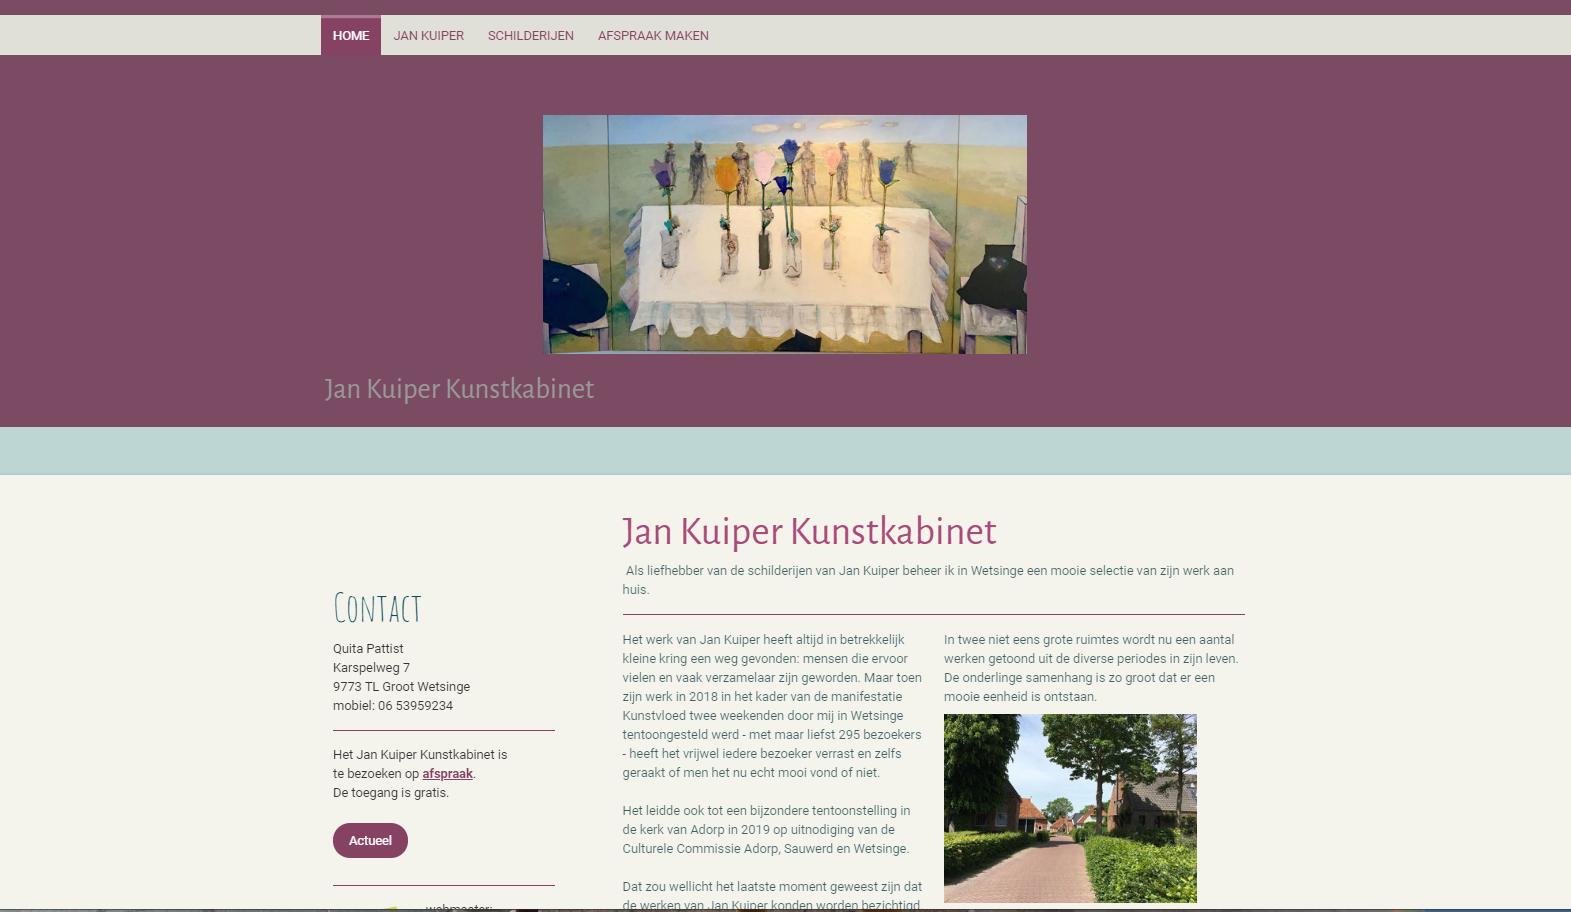 Jan Kuiper Kunstkabinet